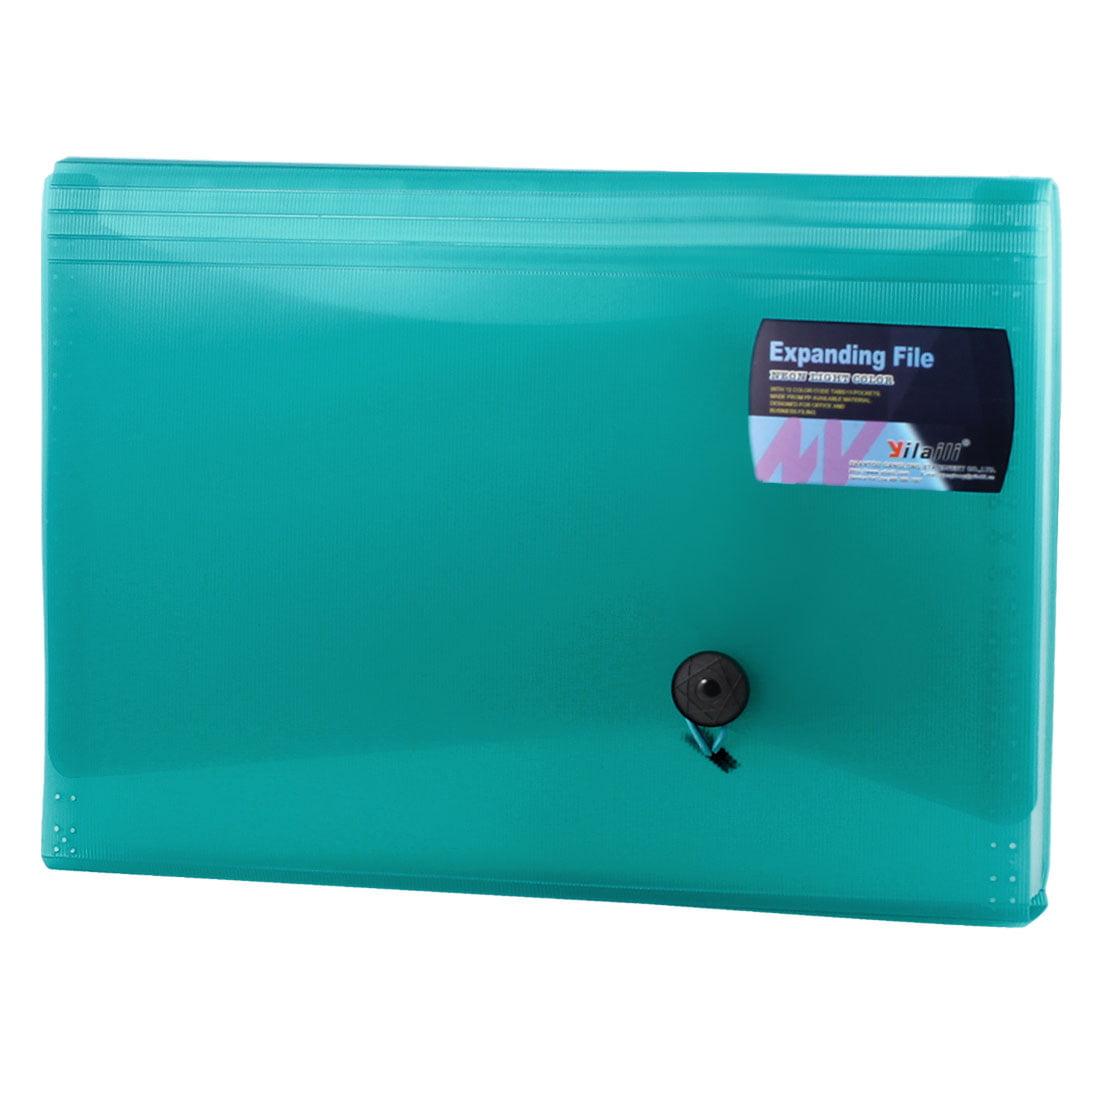 Unique Bargains Green Plastic Cover 13 Slots Paper Document File Holder Organizer Bag